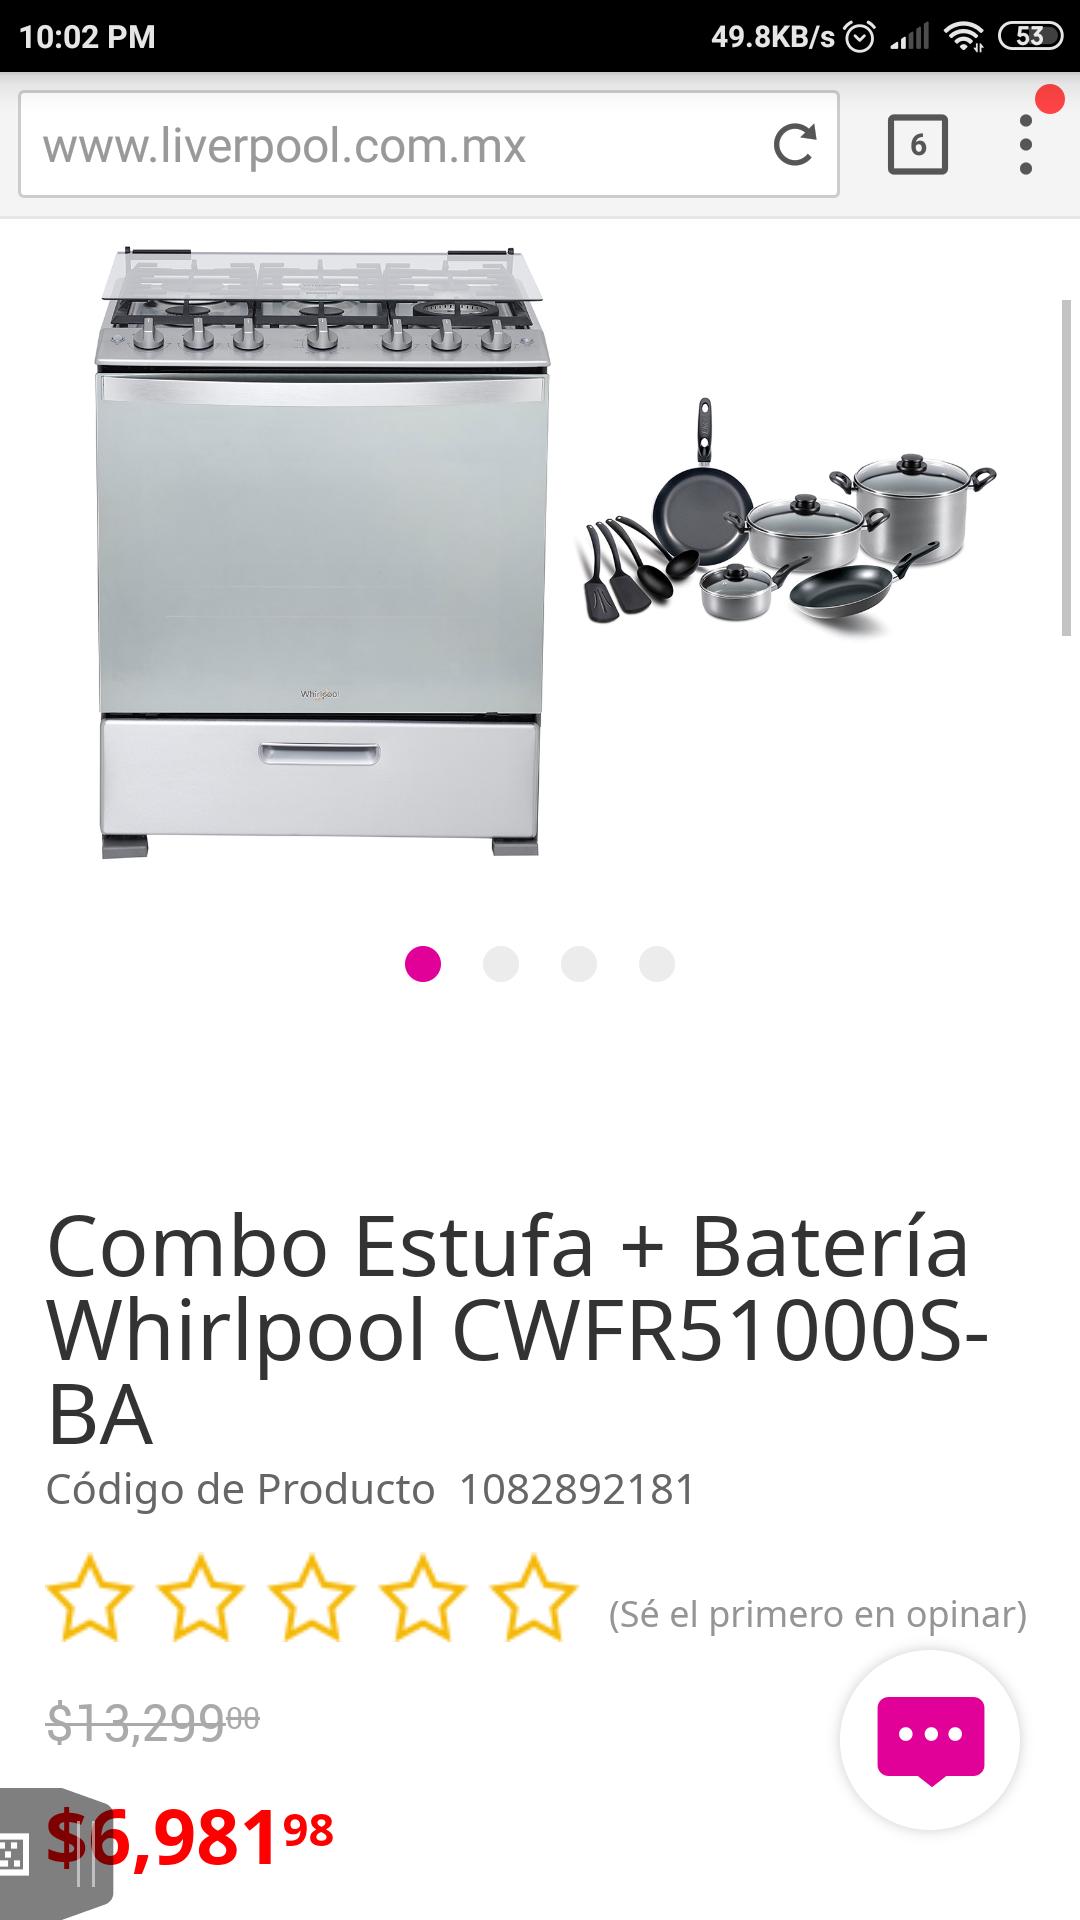 Liverpool: Combo Estufa + Batería Whirlpool CWFR51000S-BA